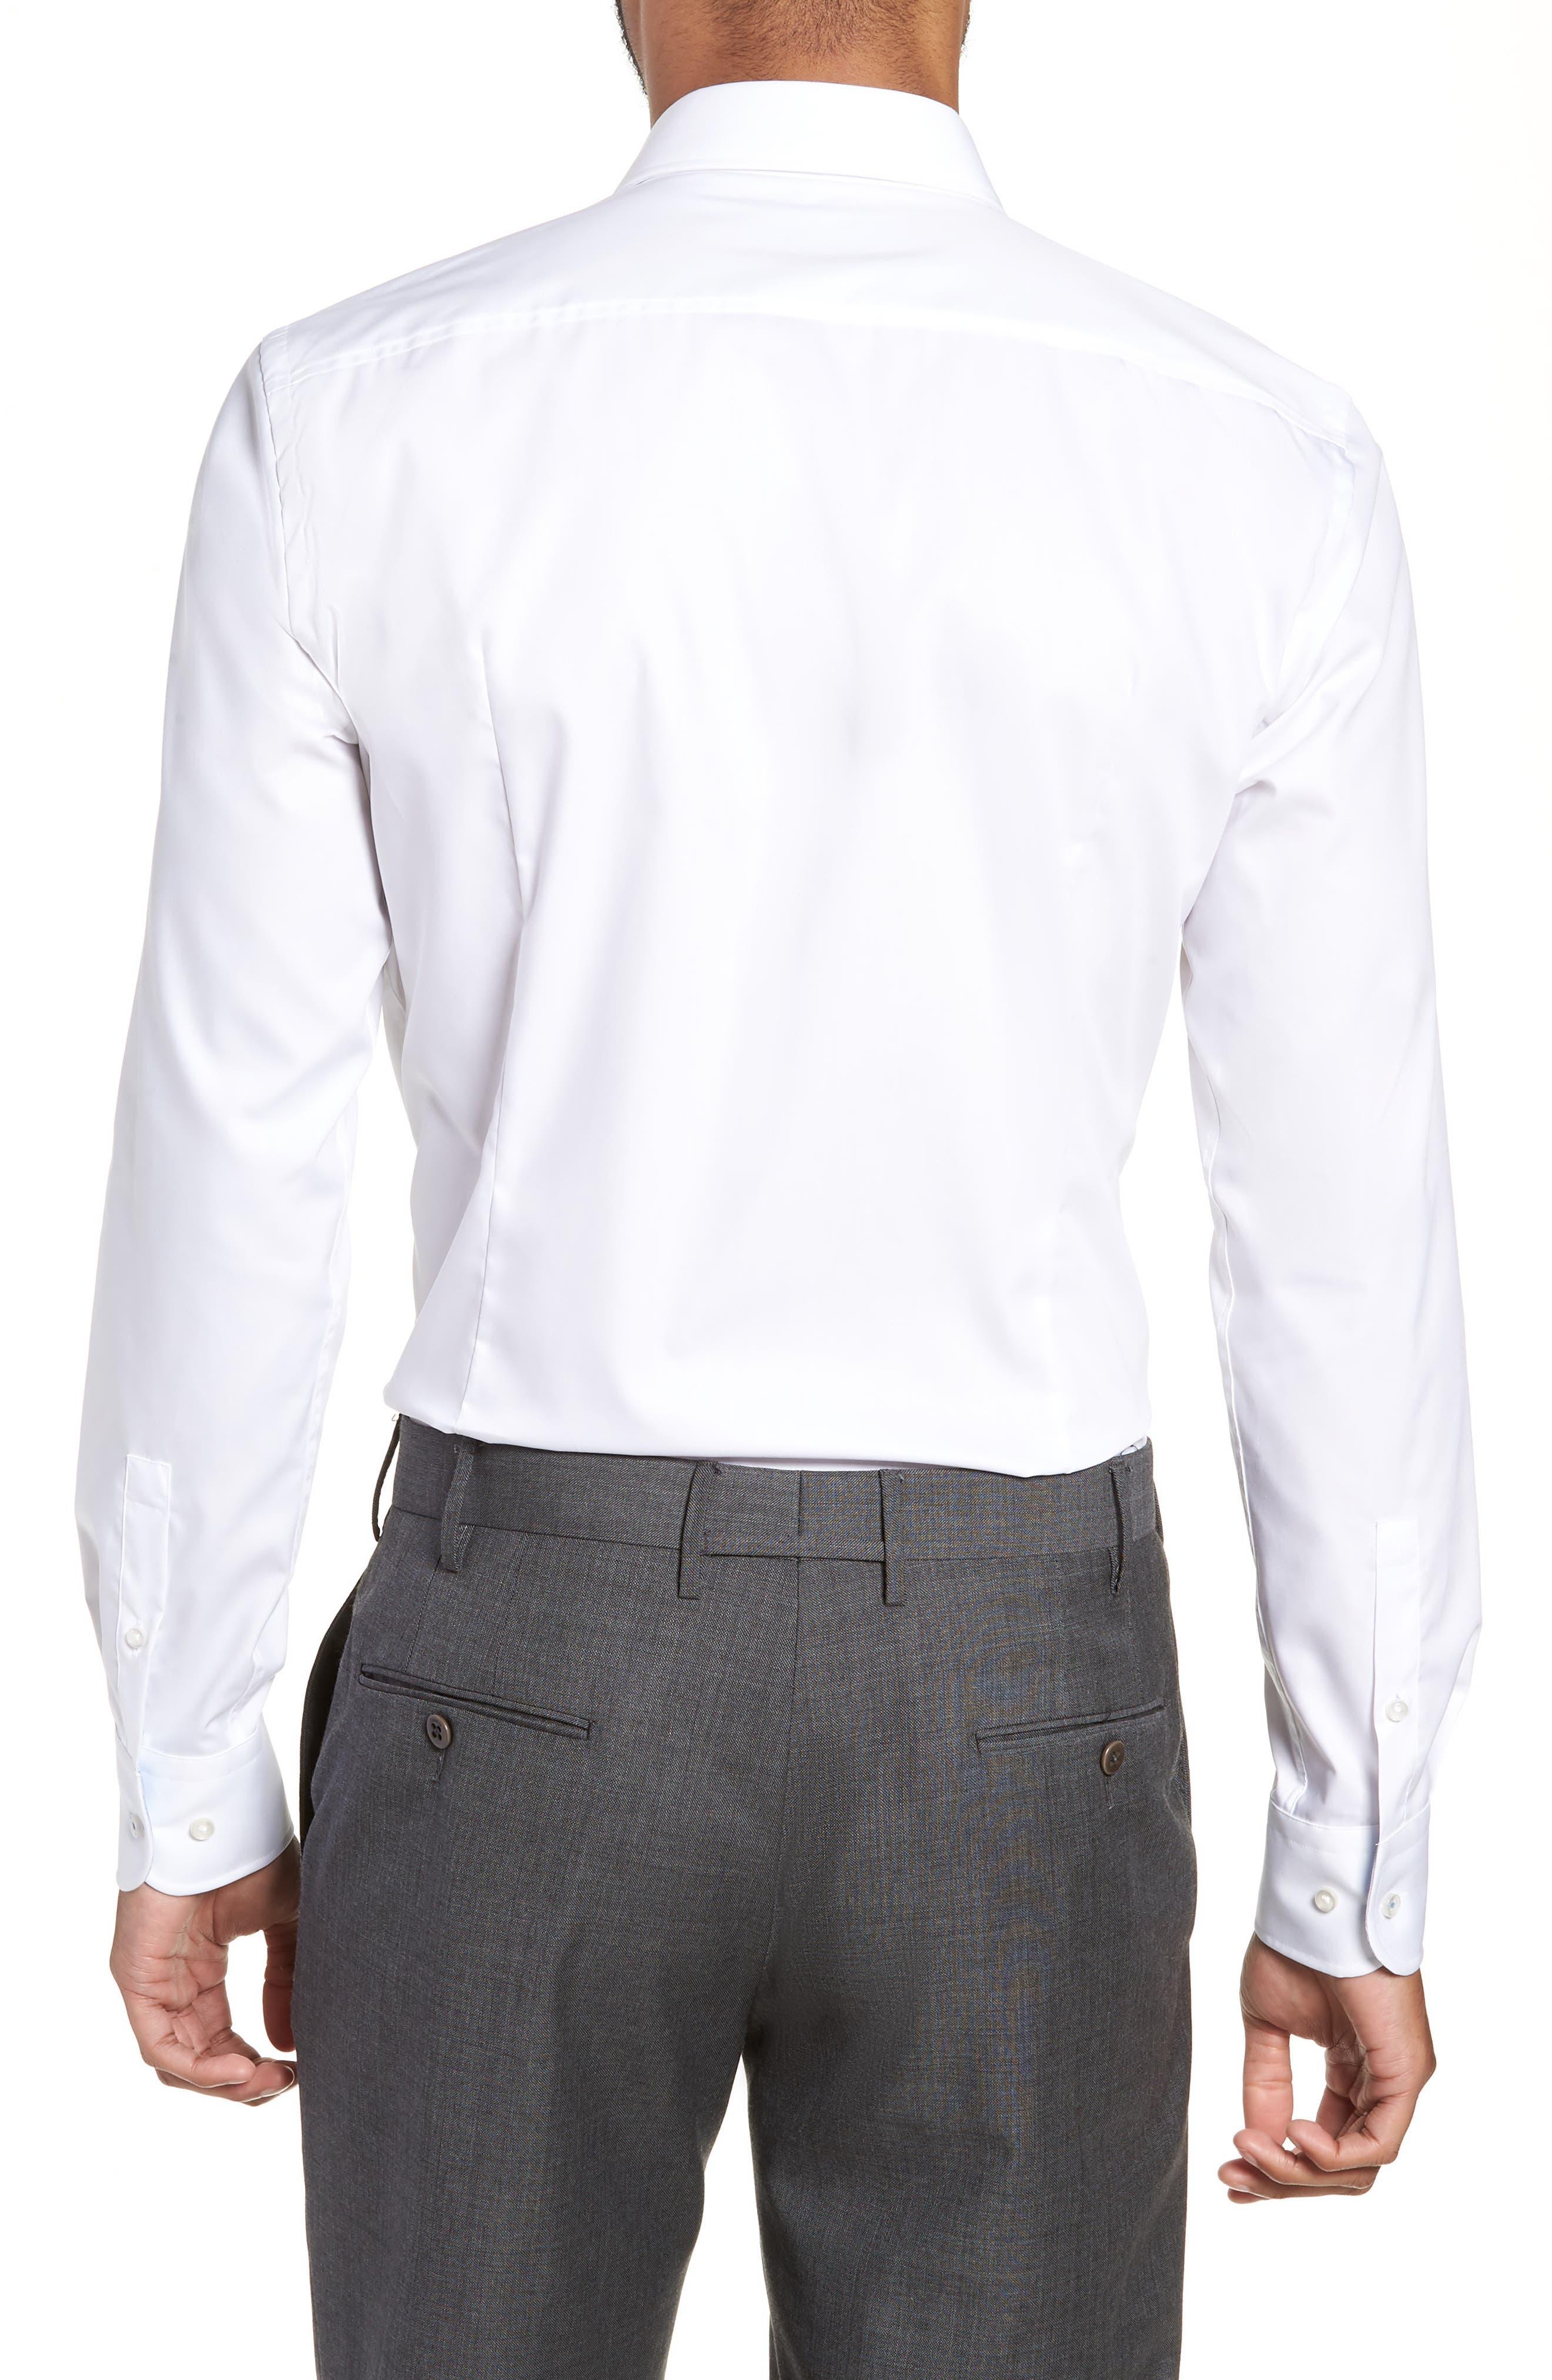 Jesse Slim Fit Easy Iron Dress Shirt,                             Alternate thumbnail 3, color,                             White